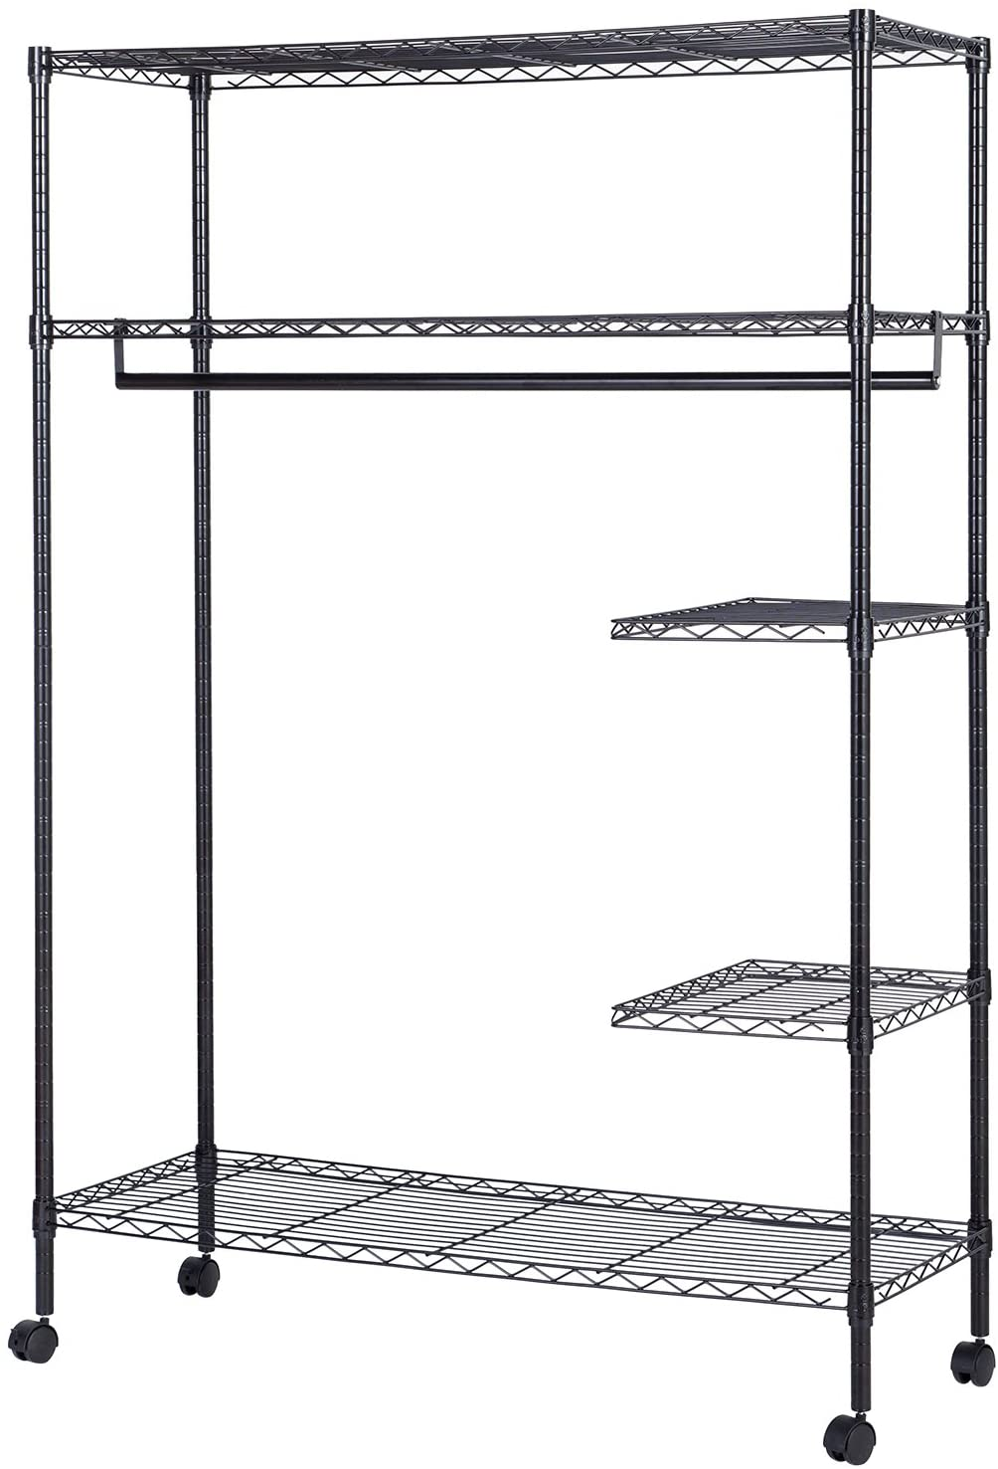 JS HOME Wardrobe Srorage Orginizer/Garment Rack, One Hanging Rod, Stury Wire, Extra Large - Black